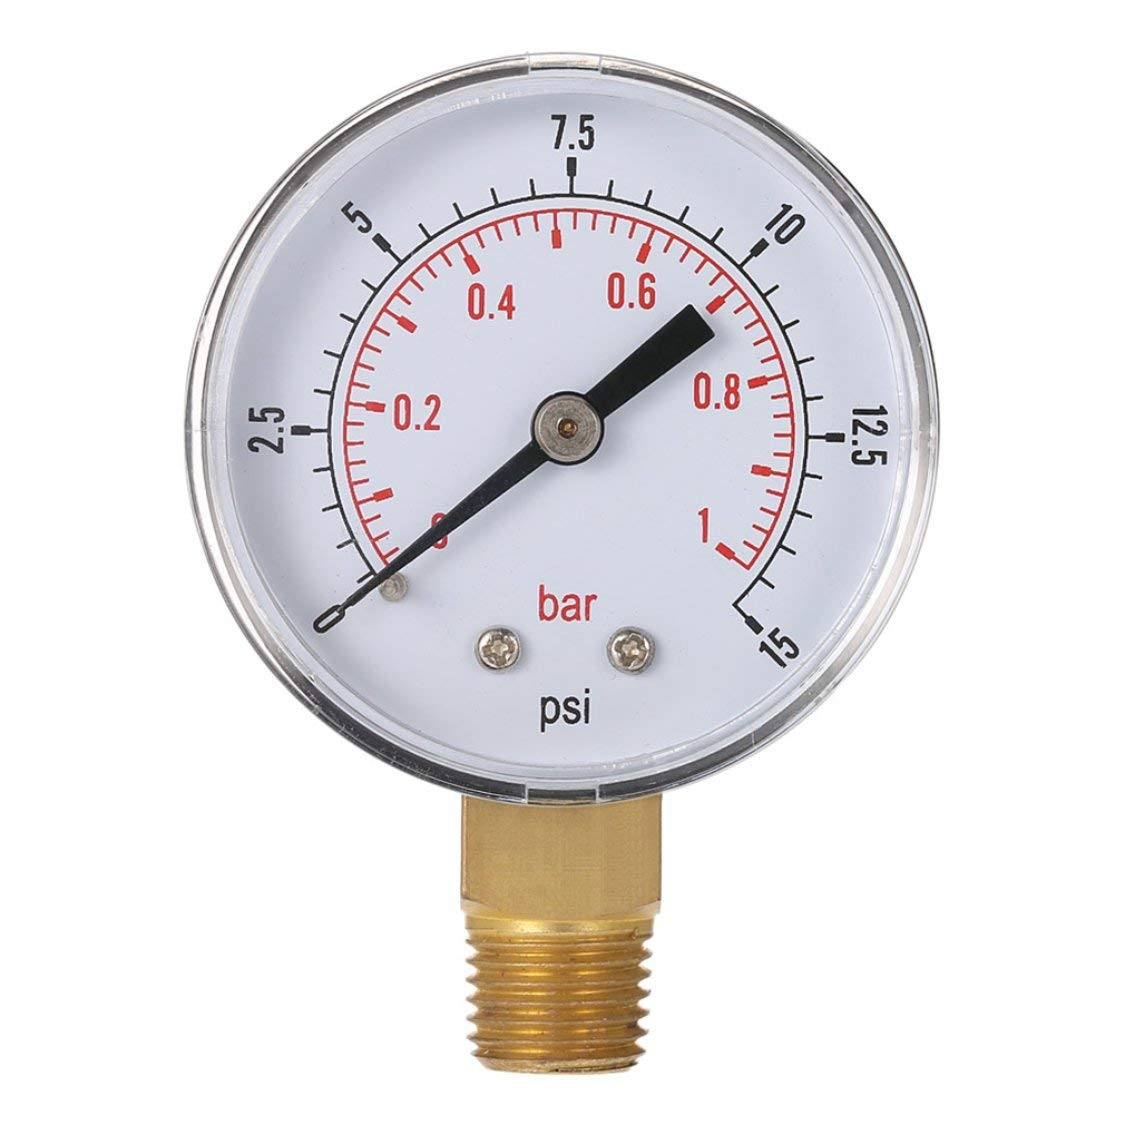 Mini-Niederdruck-Manometer f/ür Kraftstoff Luft /Öl oder Wasser 50mm 0-15 PSI 0-1 Bar 1//4 Zoll BSPT TS-50 Doppel-Skala-Messger/ät